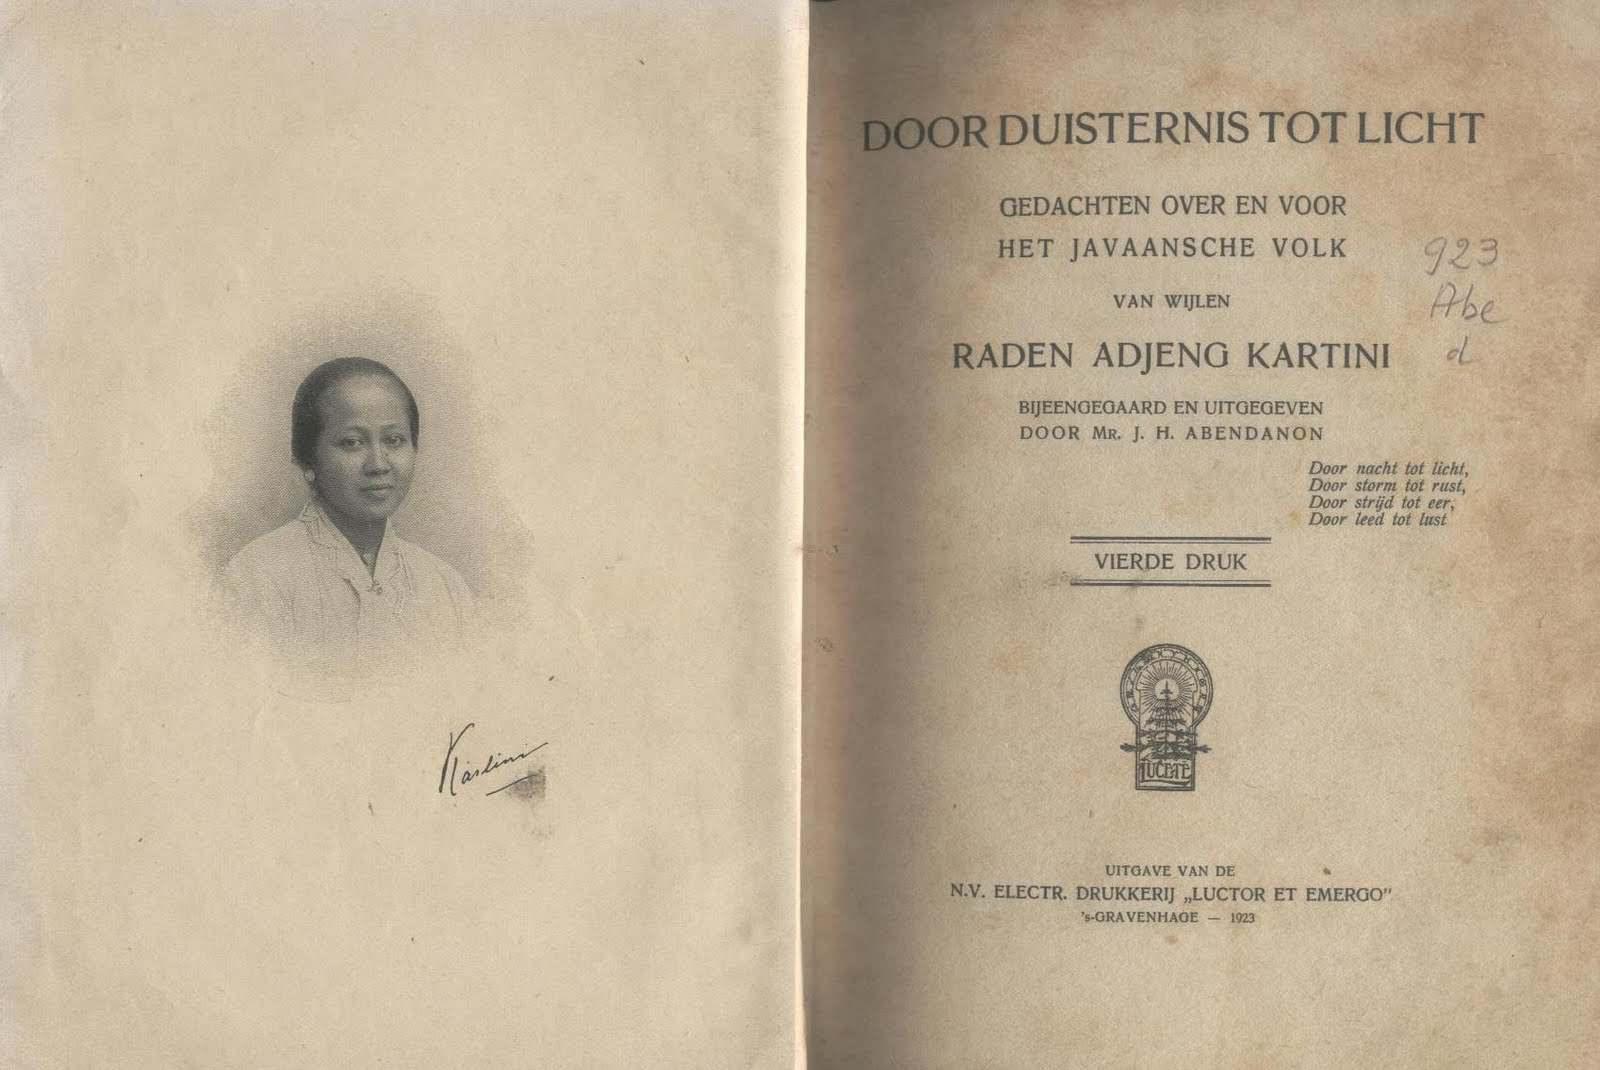 Beberapa surat Kartini kepada sahabat penanya di Belanda dibukukan pertama kali dalma bahasa Belanda